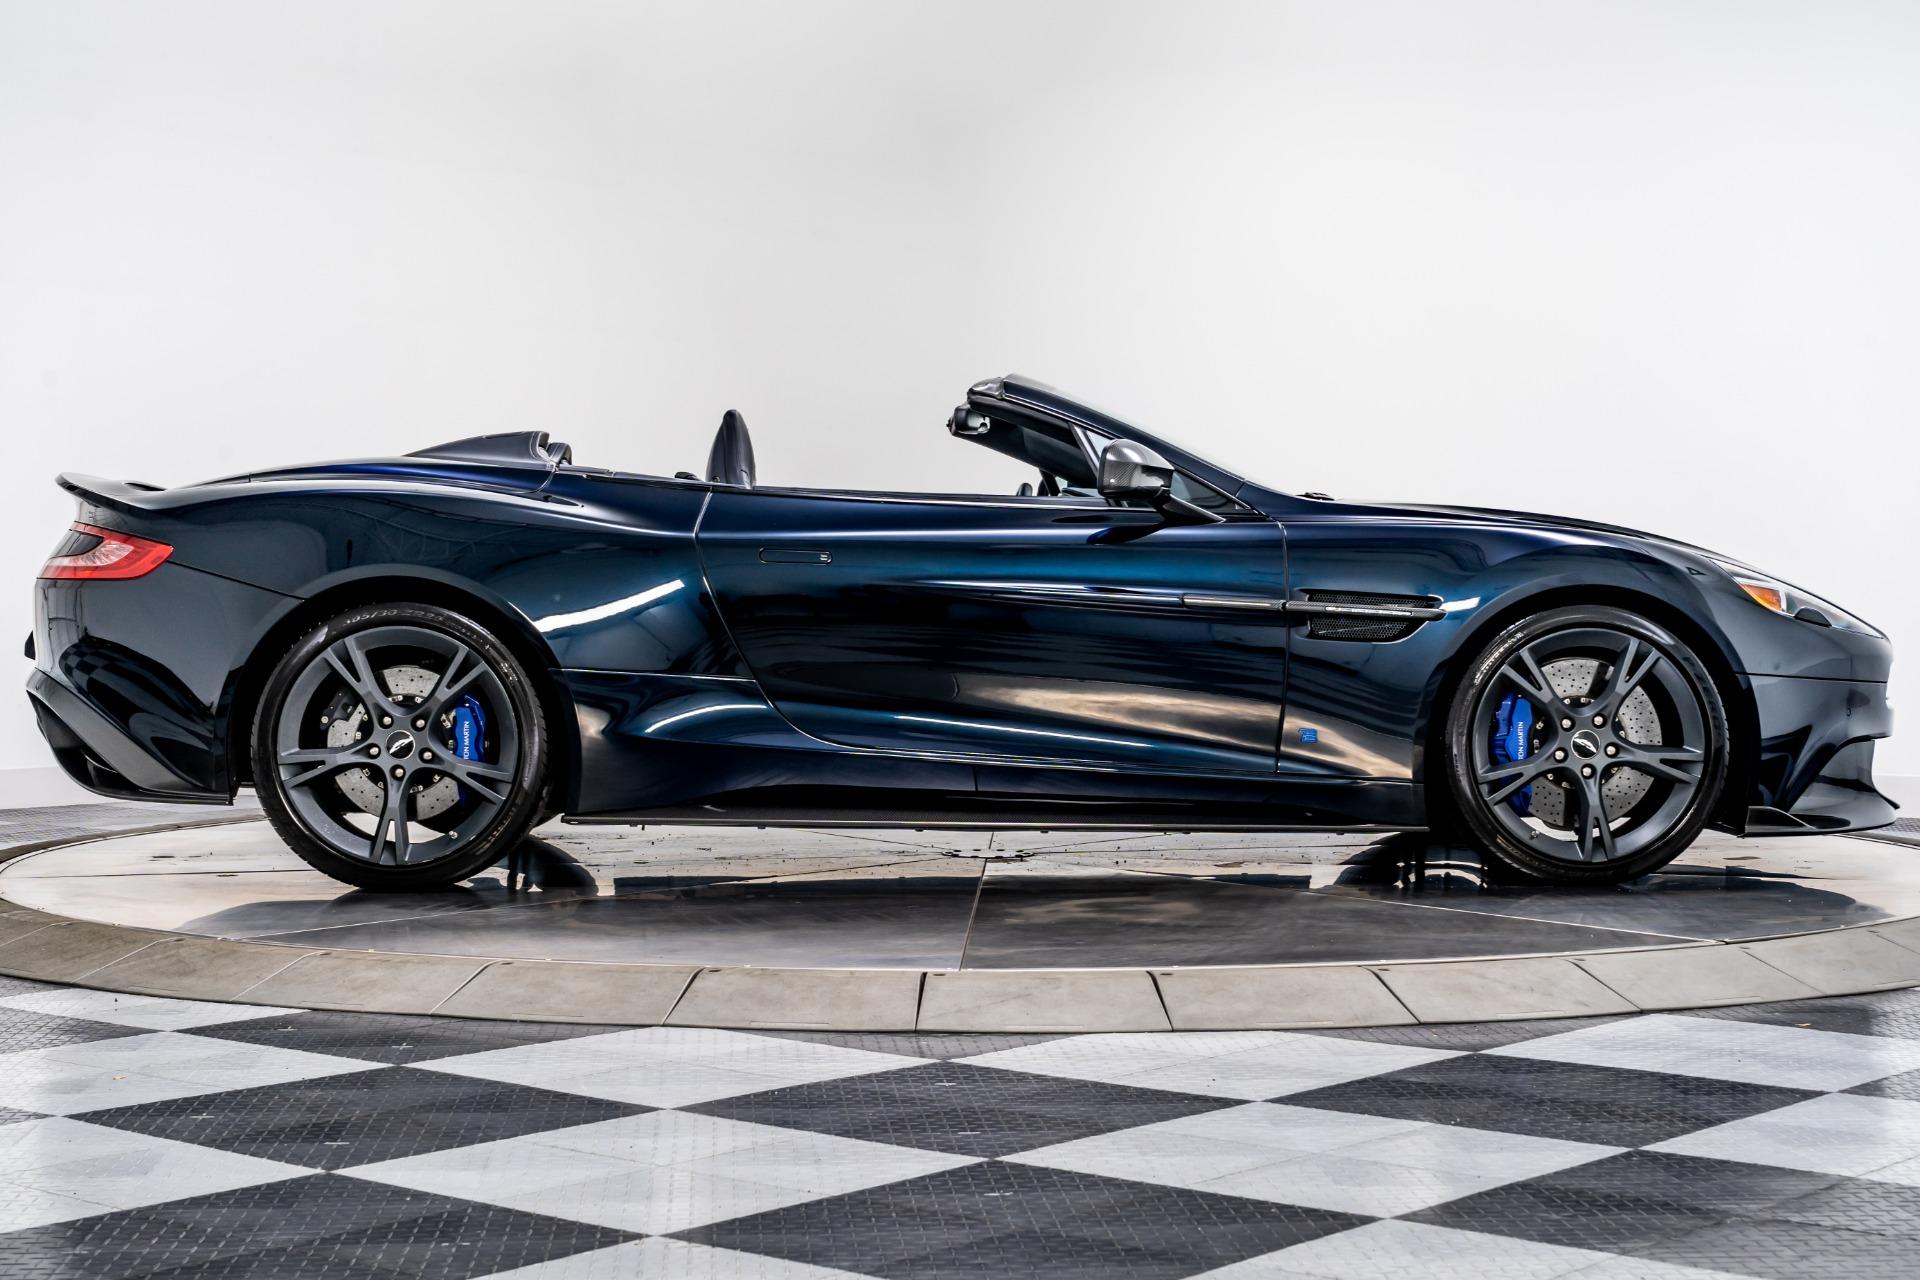 Used 2018 Aston Martin Vanquish S Volante Tom Brady Signature Edition For Sale Sold Marshall Goldman Motor Sales Stock W21431